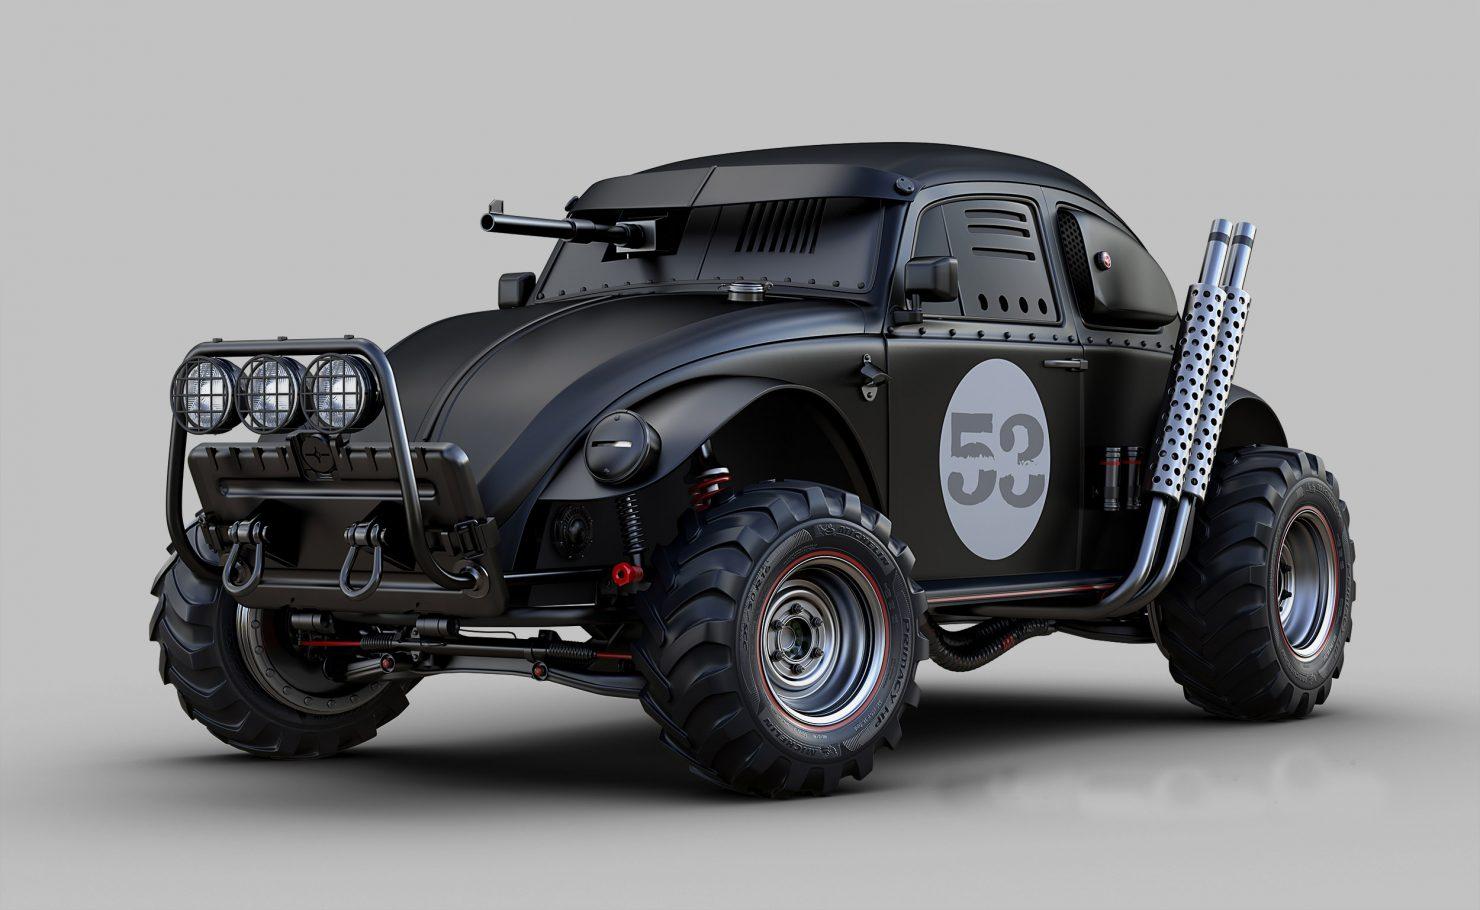 DARK BEETLE 1480x910 - The Vehicles of Jomar Machado